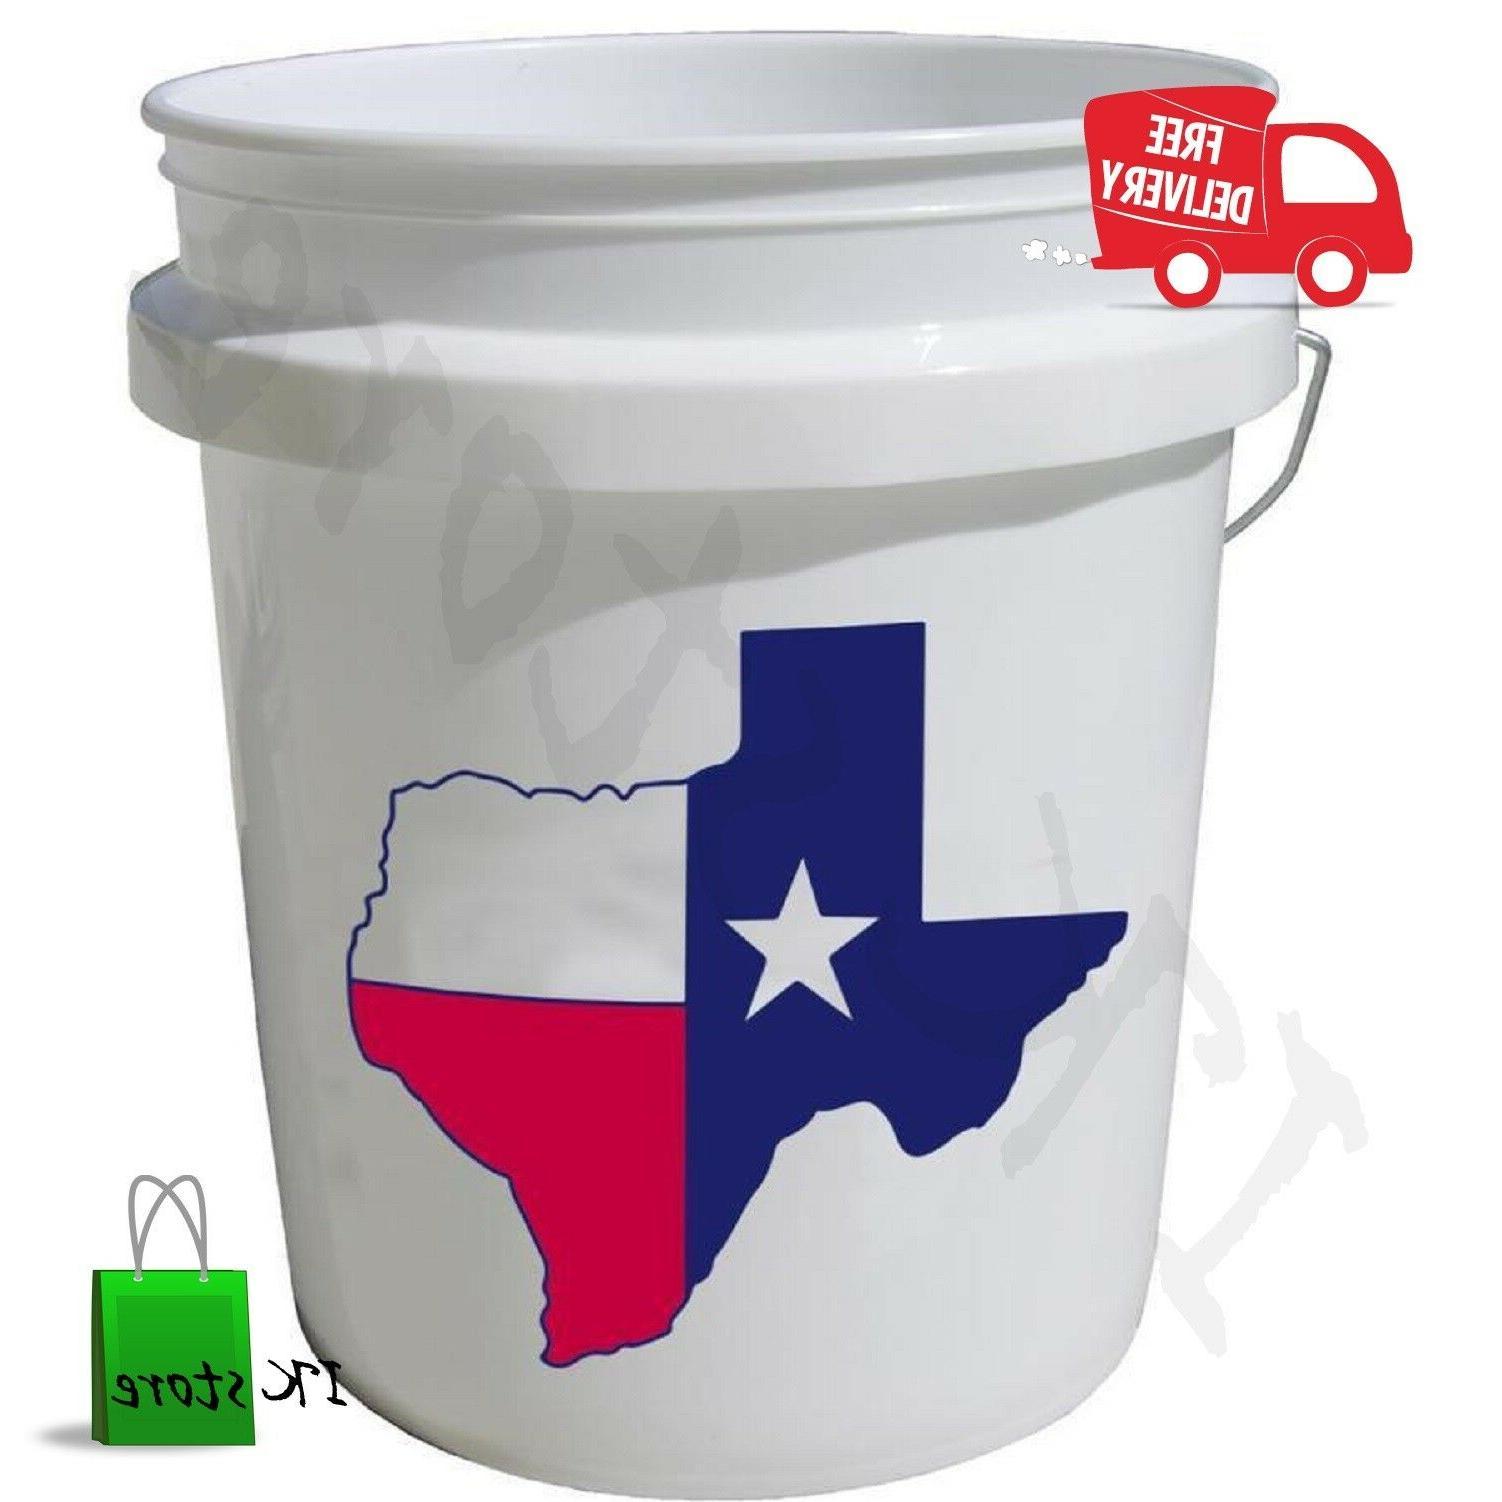 Plastic 5 Gallon Commercial Food Grade BPA Free Bucket FDA A